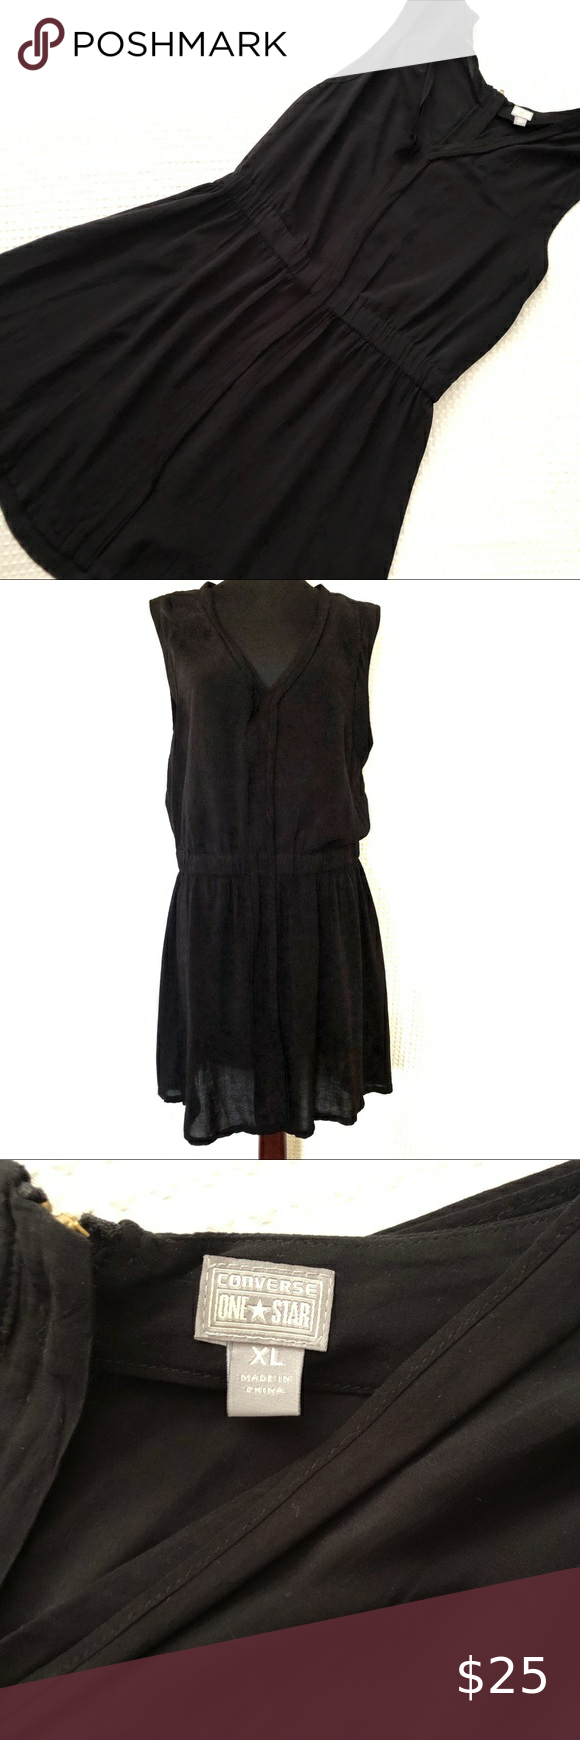 Converse Black Dress Xl Black Dress Xl Dress Clothes Design [ 1740 x 580 Pixel ]